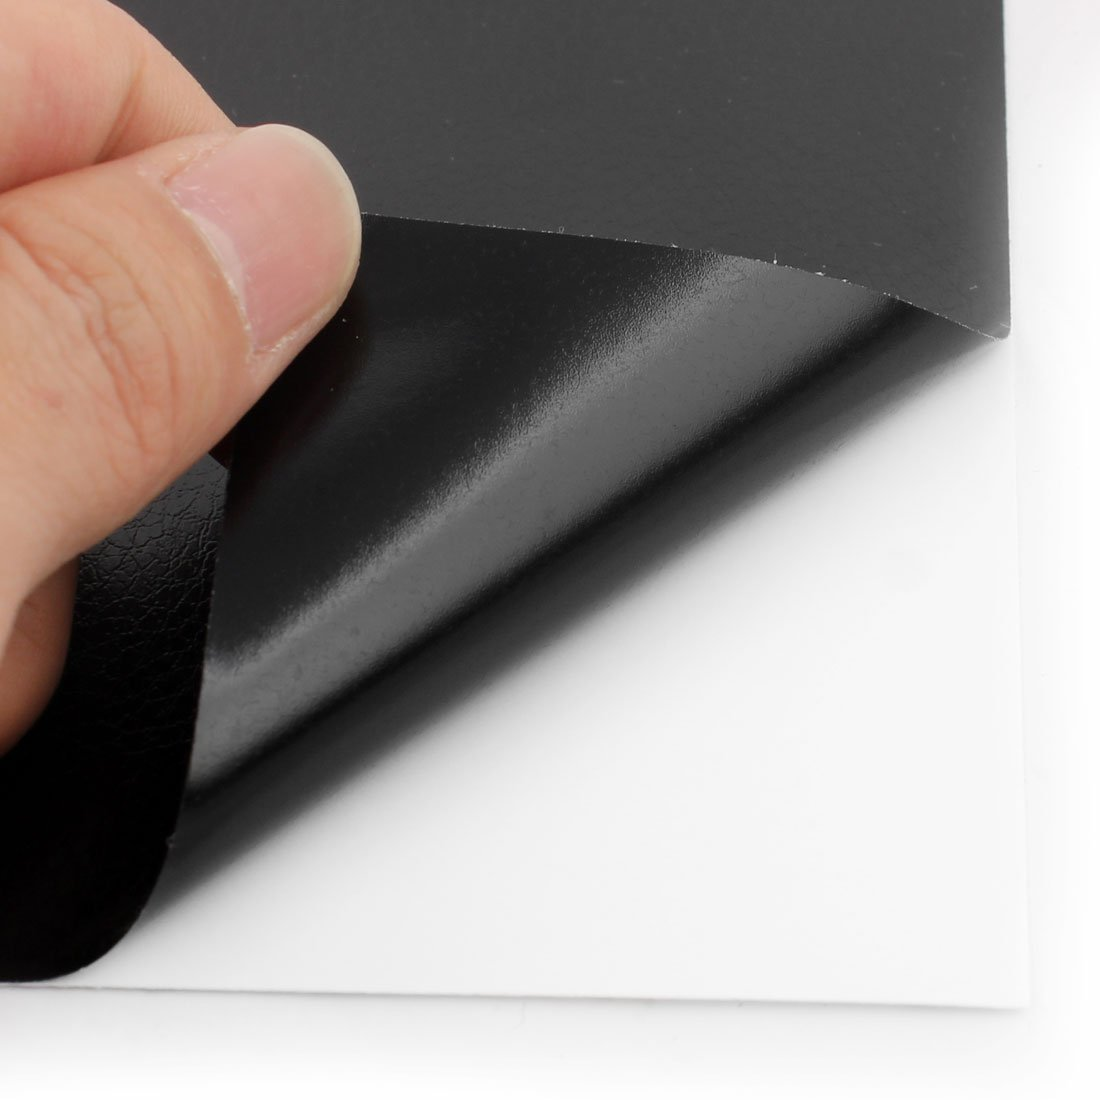 Amazon.com : eDealMax Negro PVC adhesivo Protector DIY Volver ...